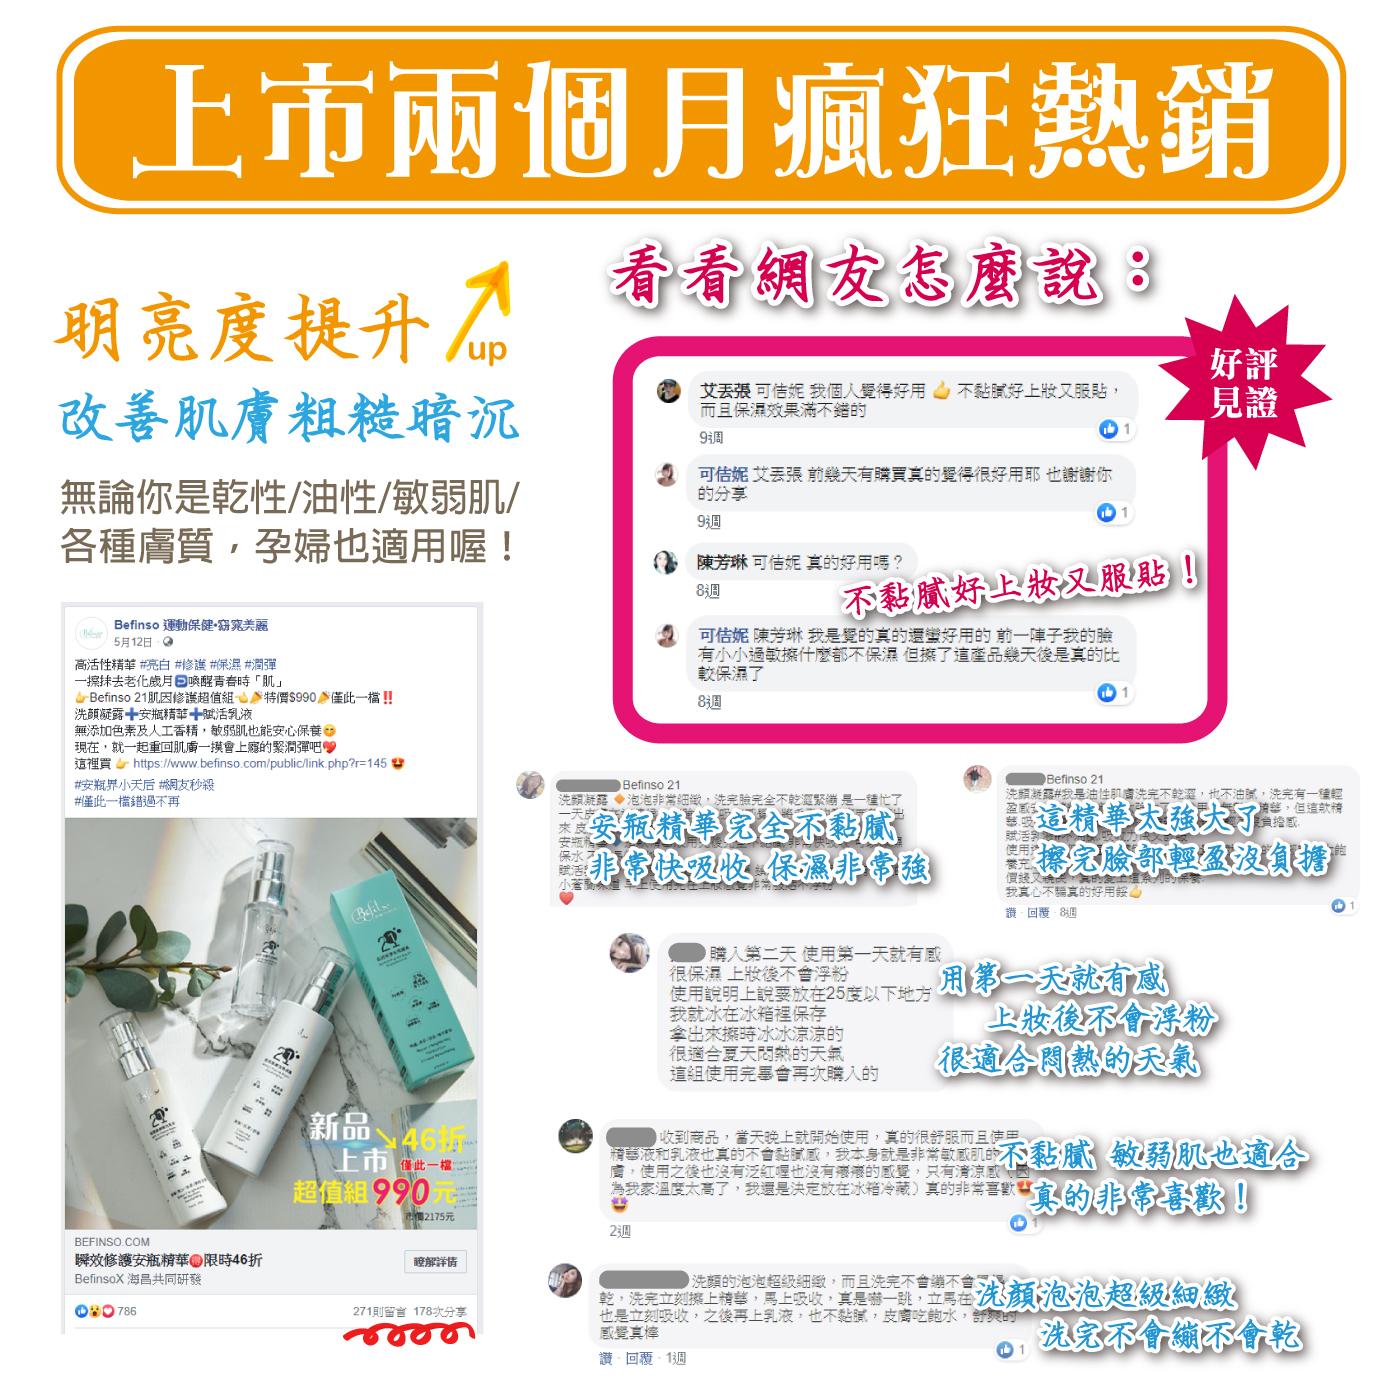 Befinso 21肌因修護安瓶精華30ml ▶ Befinso X 海昌 共同研發,打造保養新境界!!